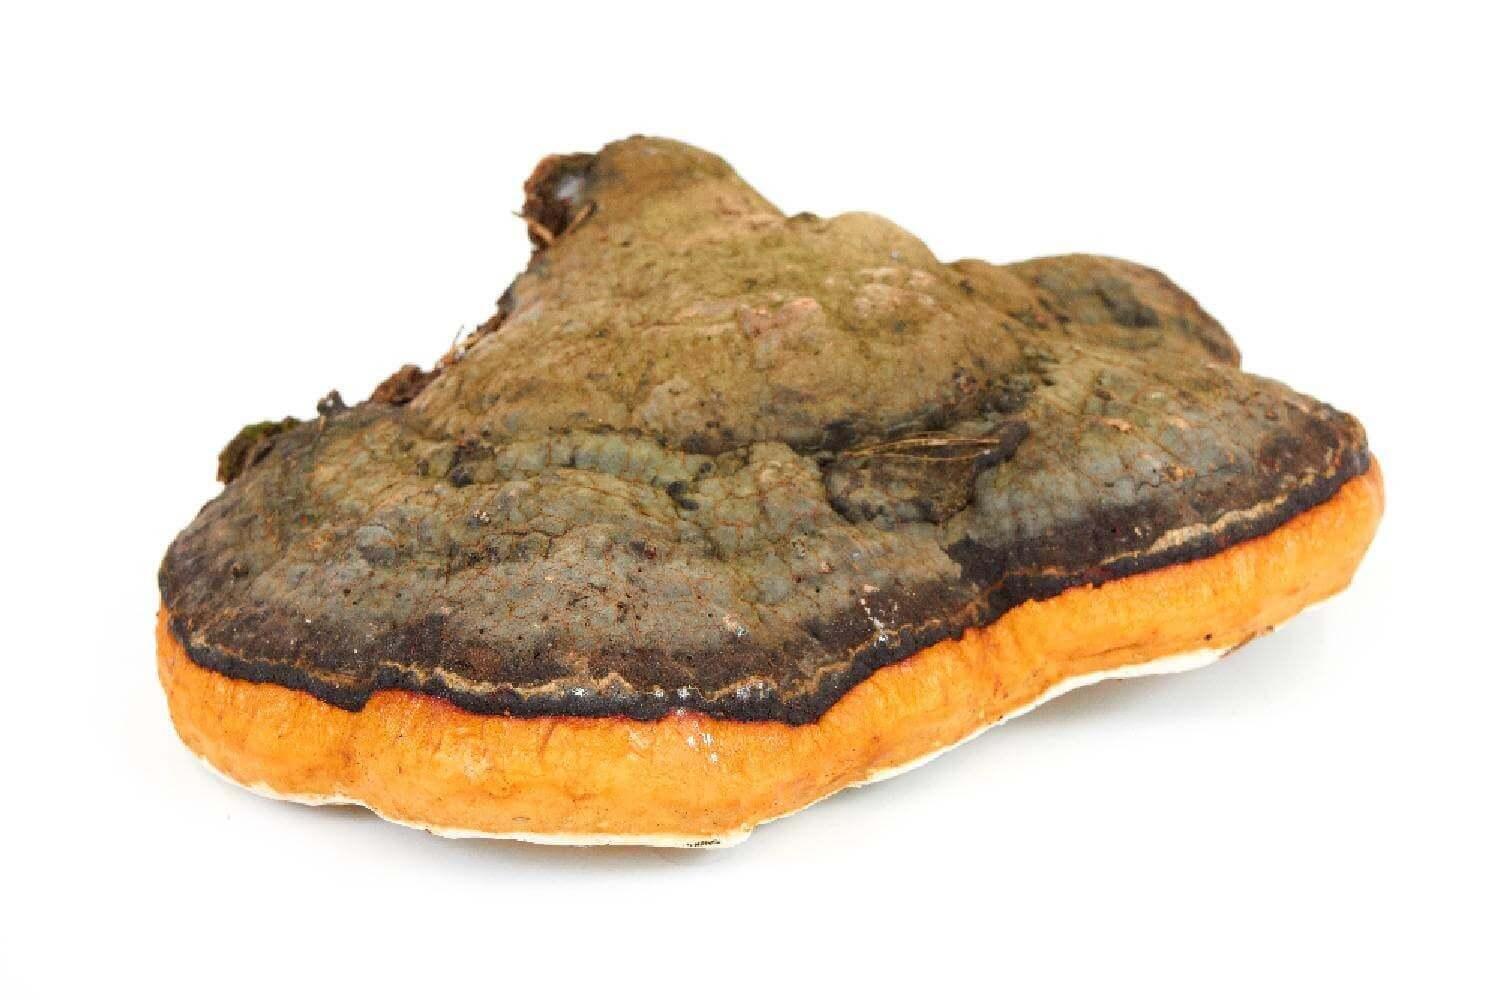 image de l'ingredient Chaga